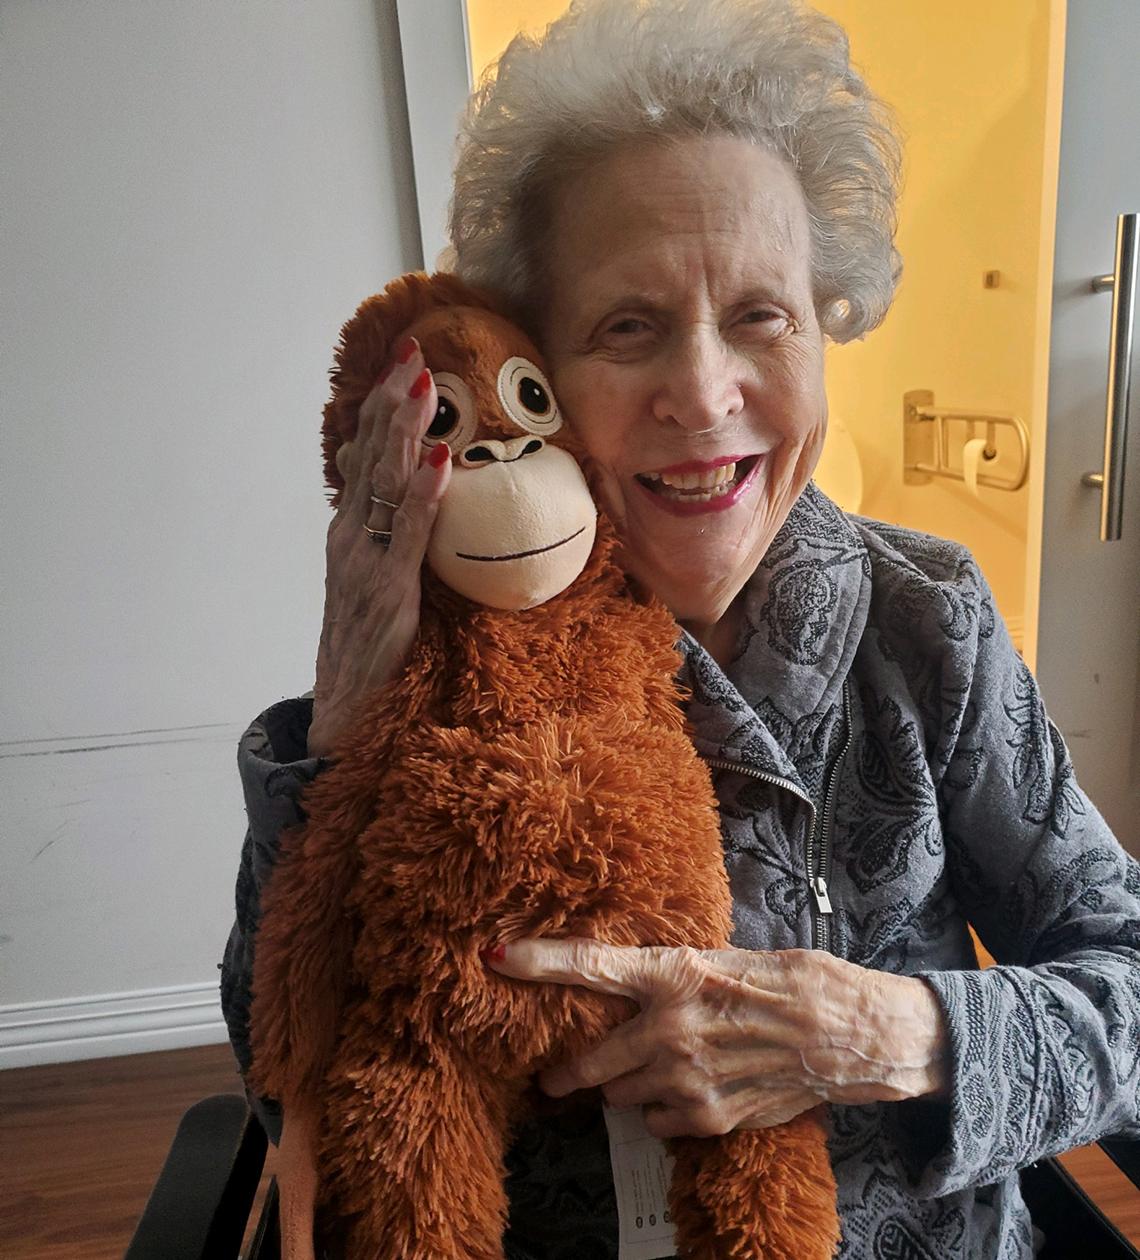 Wilma holding  a stuffed animal monkey